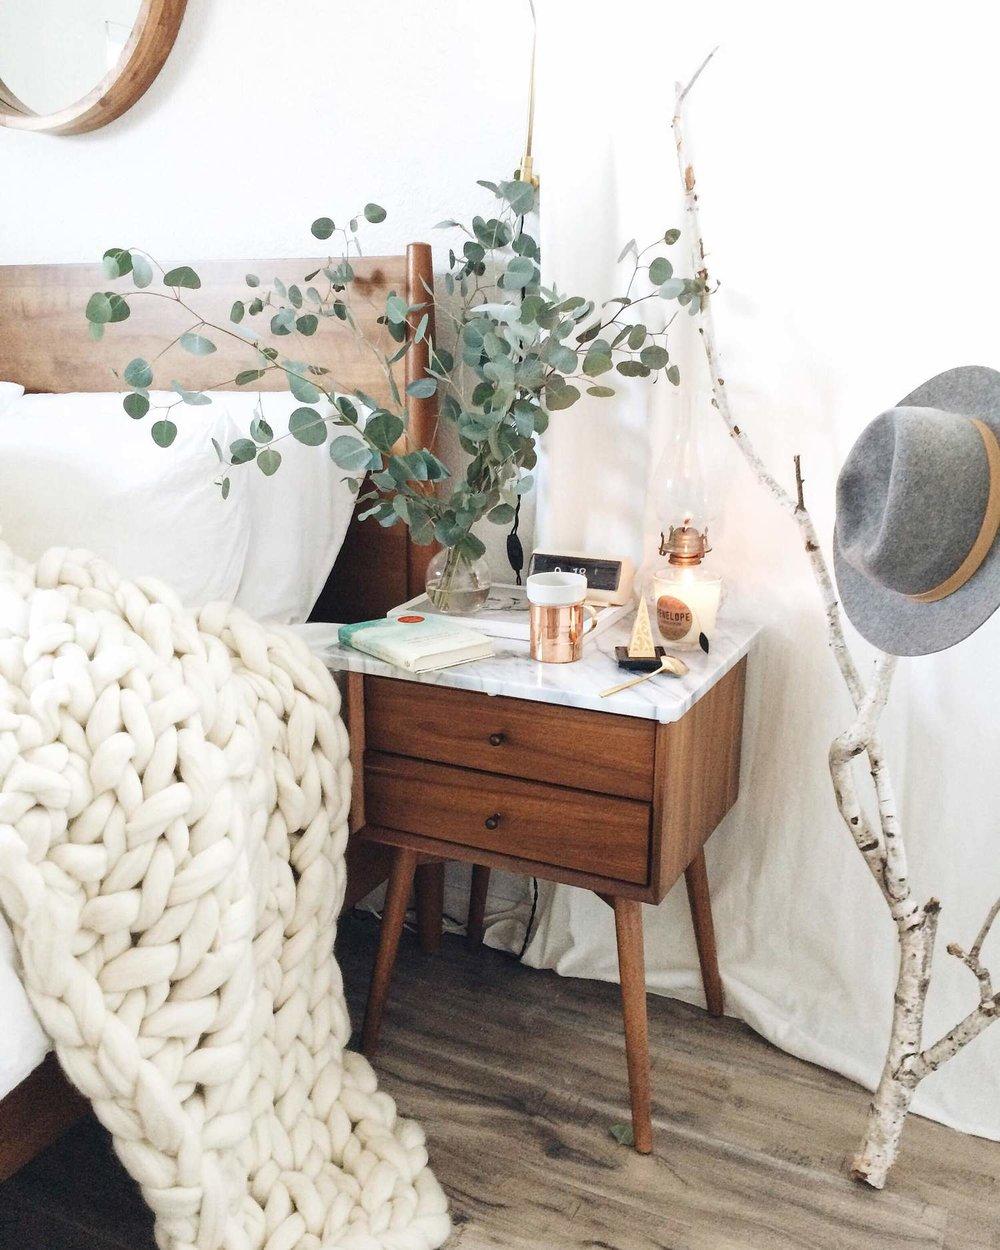 gigantic-oversized-knit-wool-blanket-bedroom.jpeg